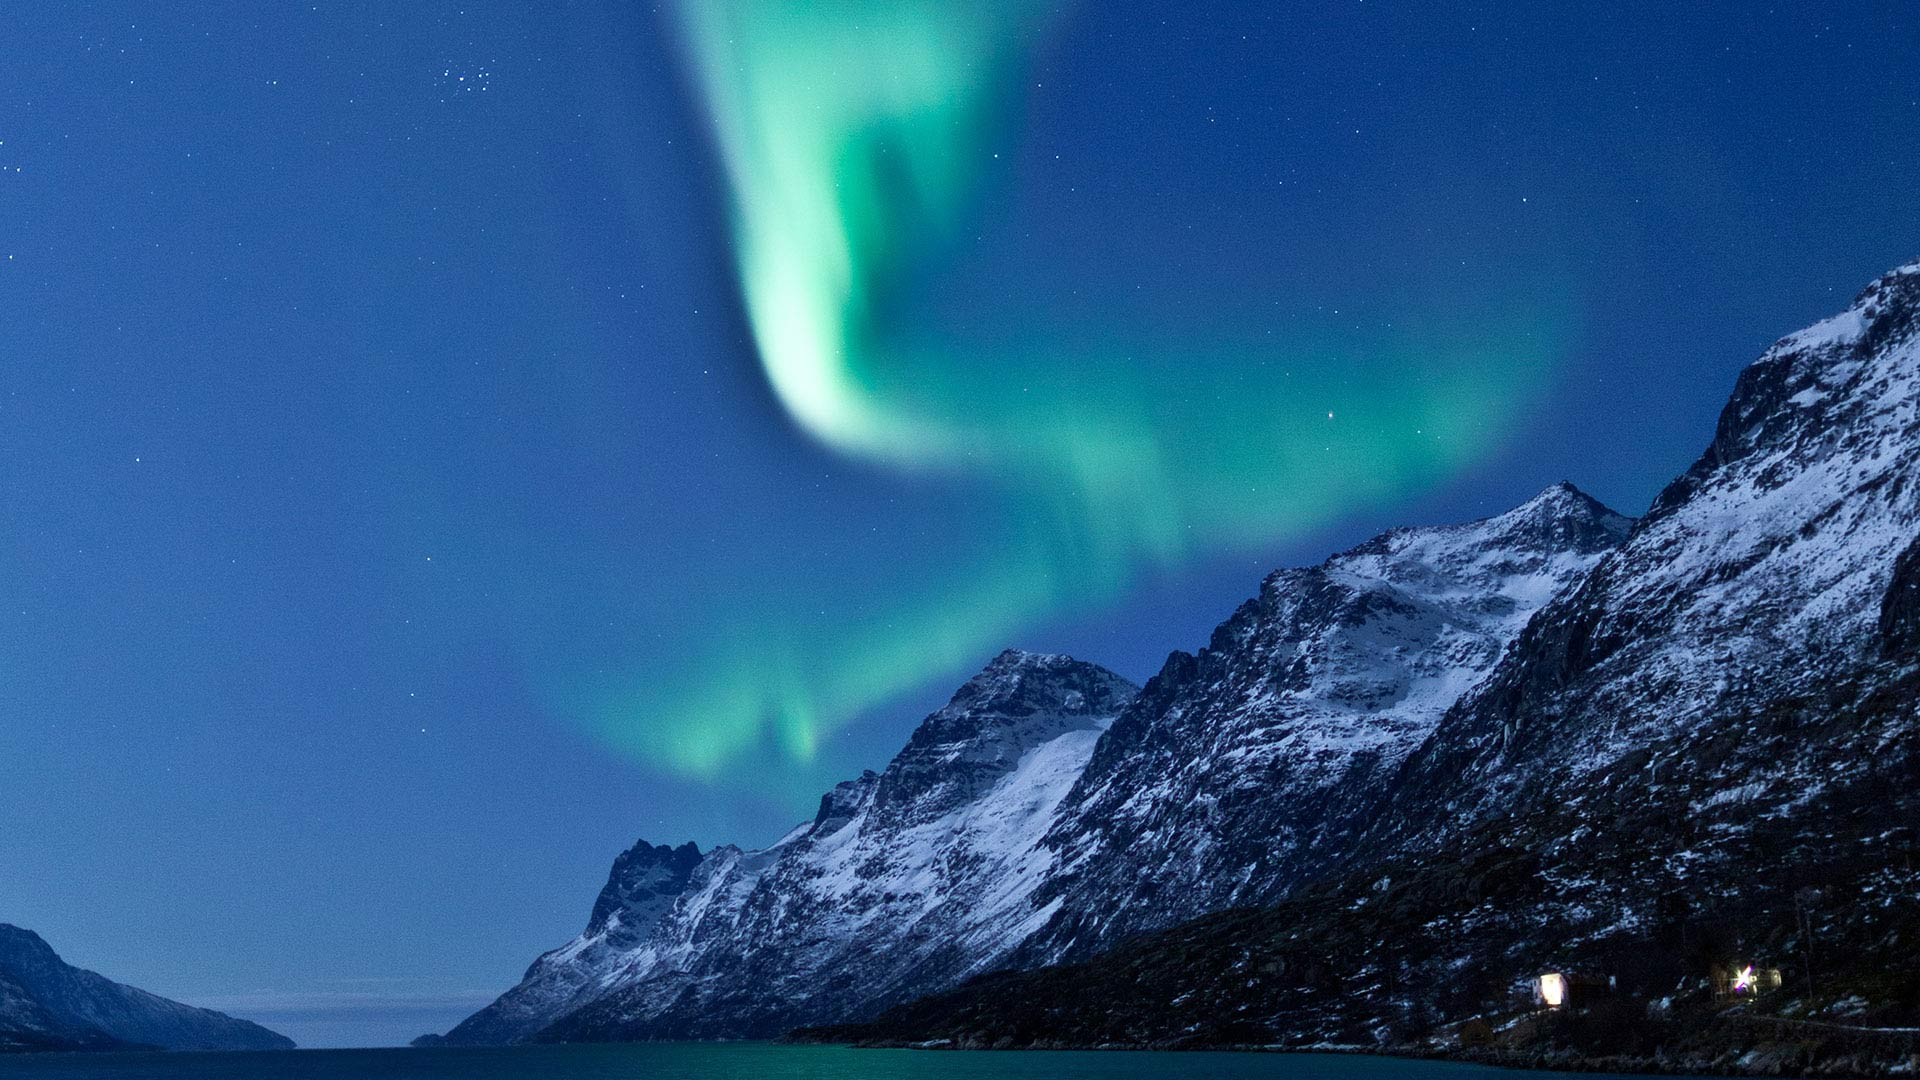 aurora adventure week in troms 6 days 5 nights nordic visitor. Black Bedroom Furniture Sets. Home Design Ideas